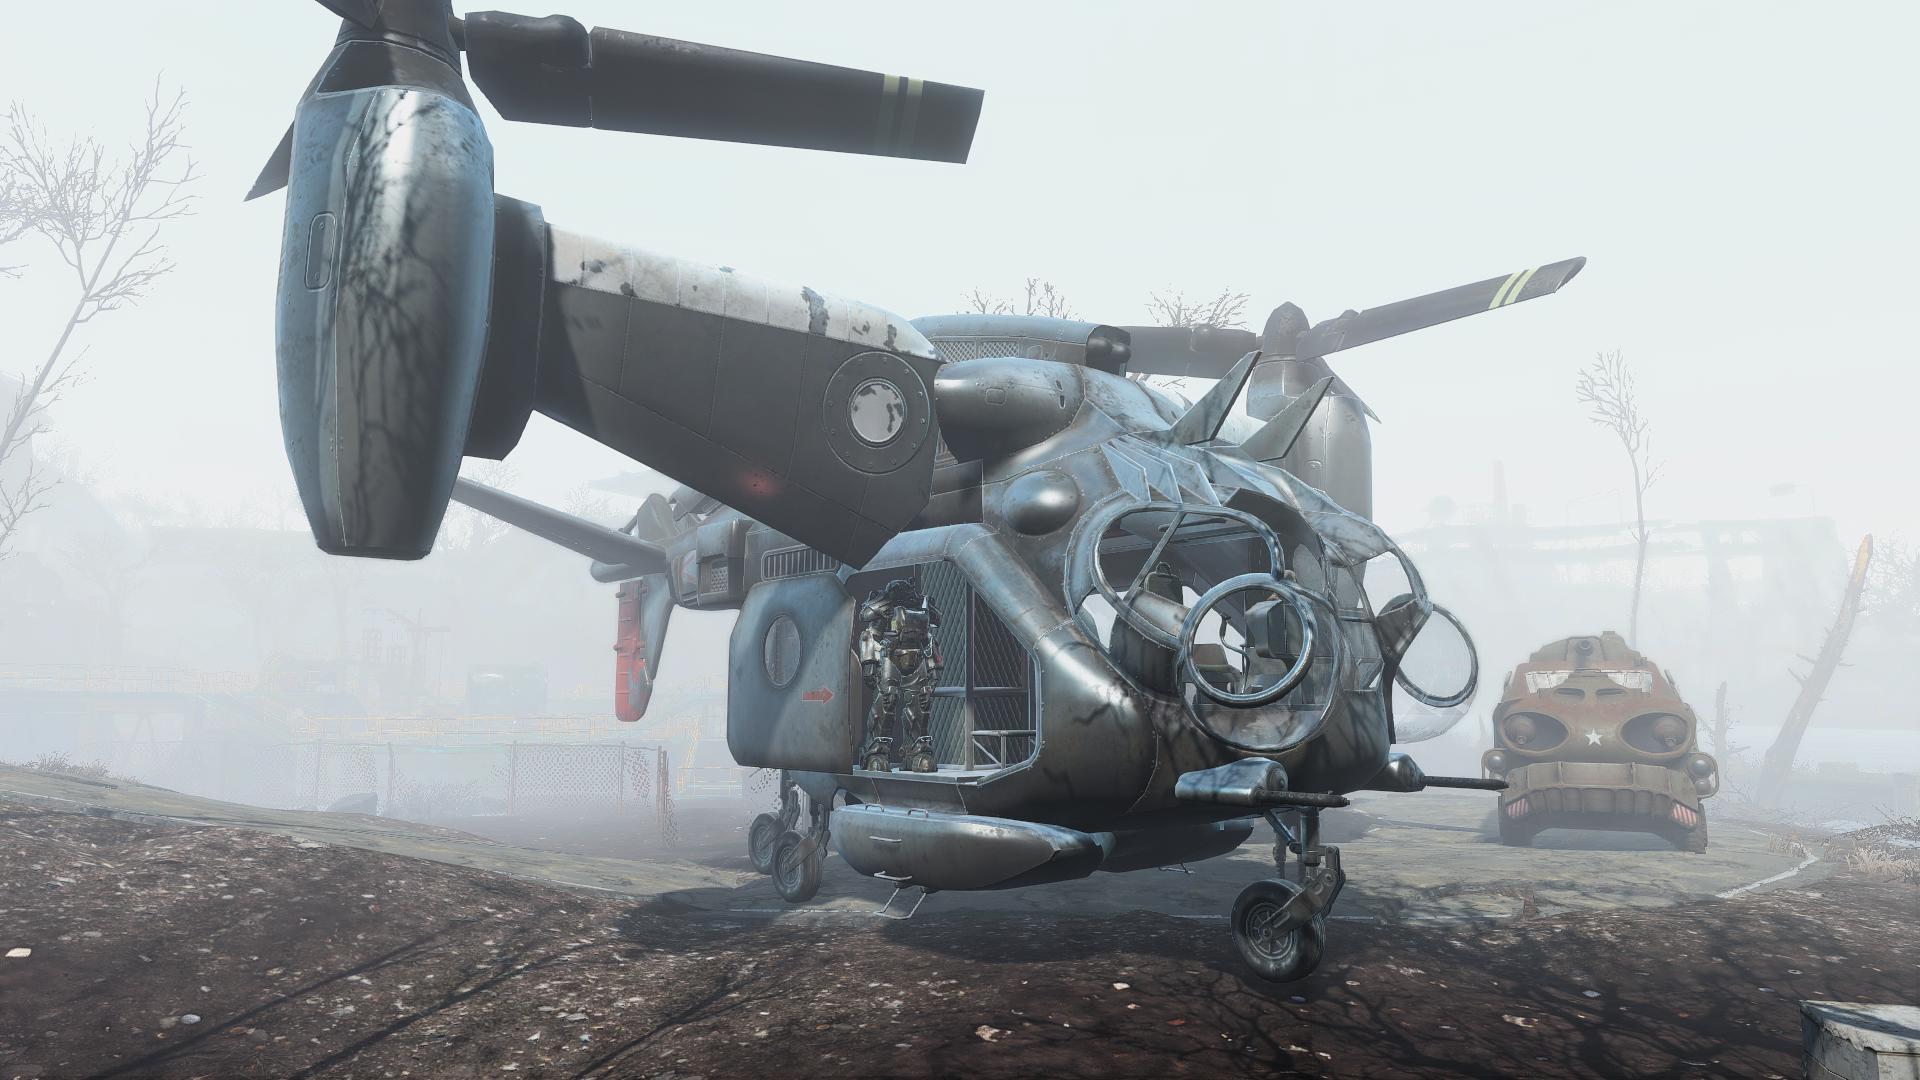 000336.Jpg - Fallout 4